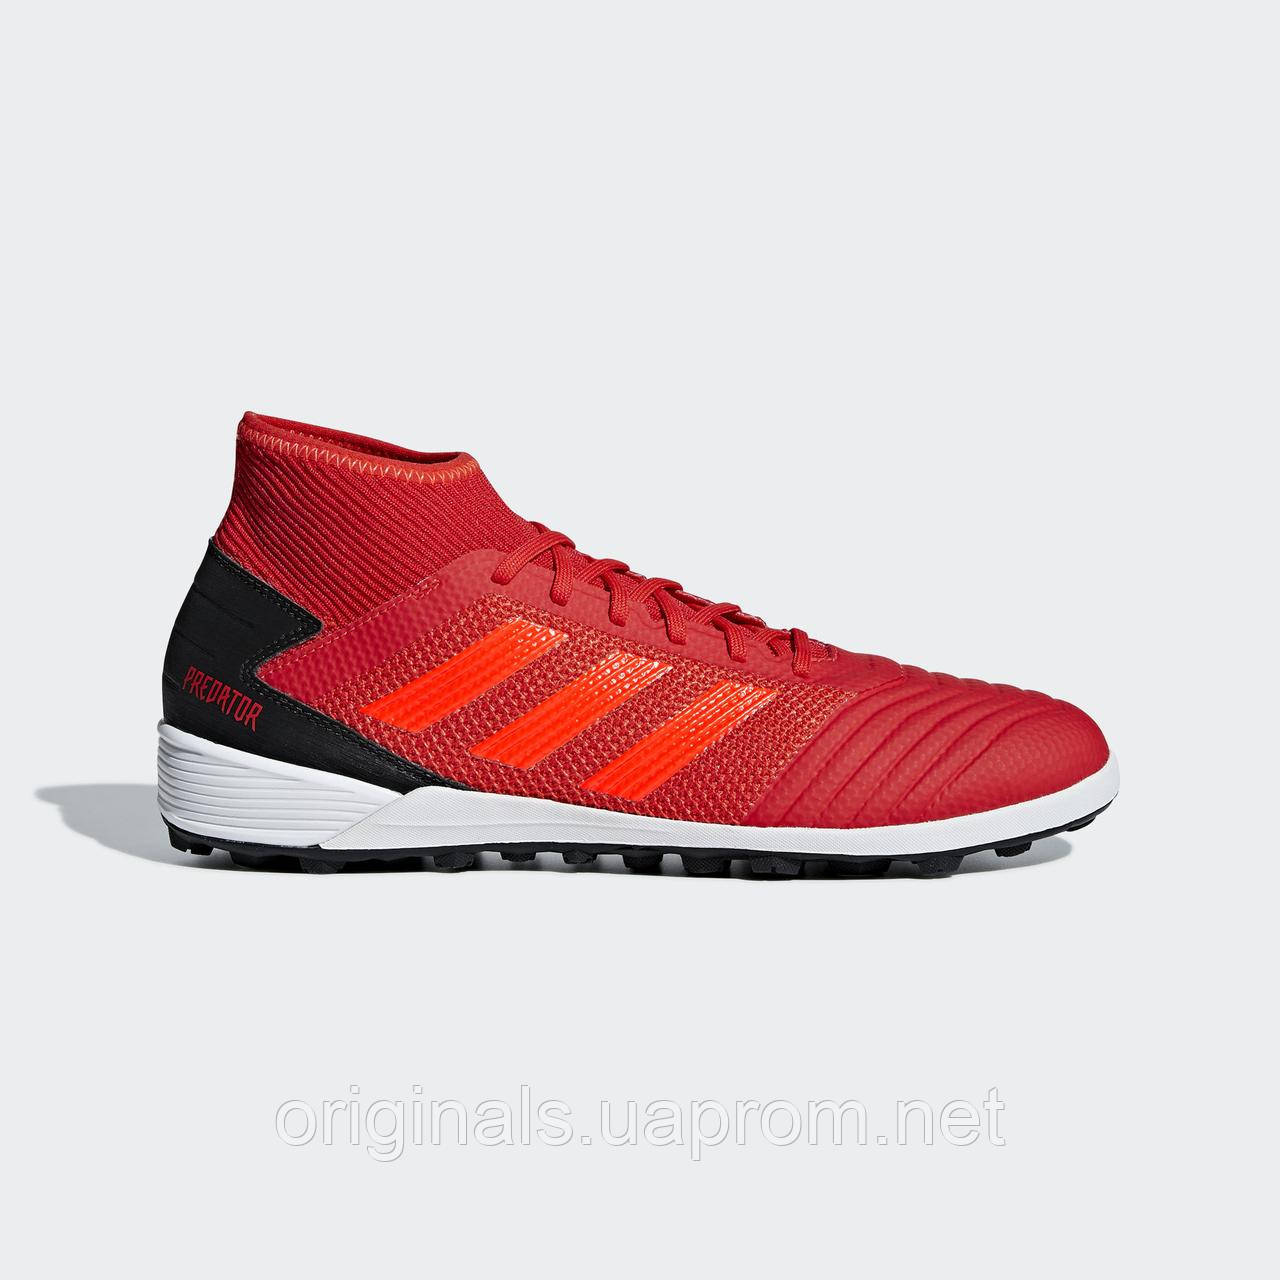 ae5e0877 Футбольные бутсы Adidas Predator Tango 19.3 TF D97962 - 2018/2 -  интернет-магазин